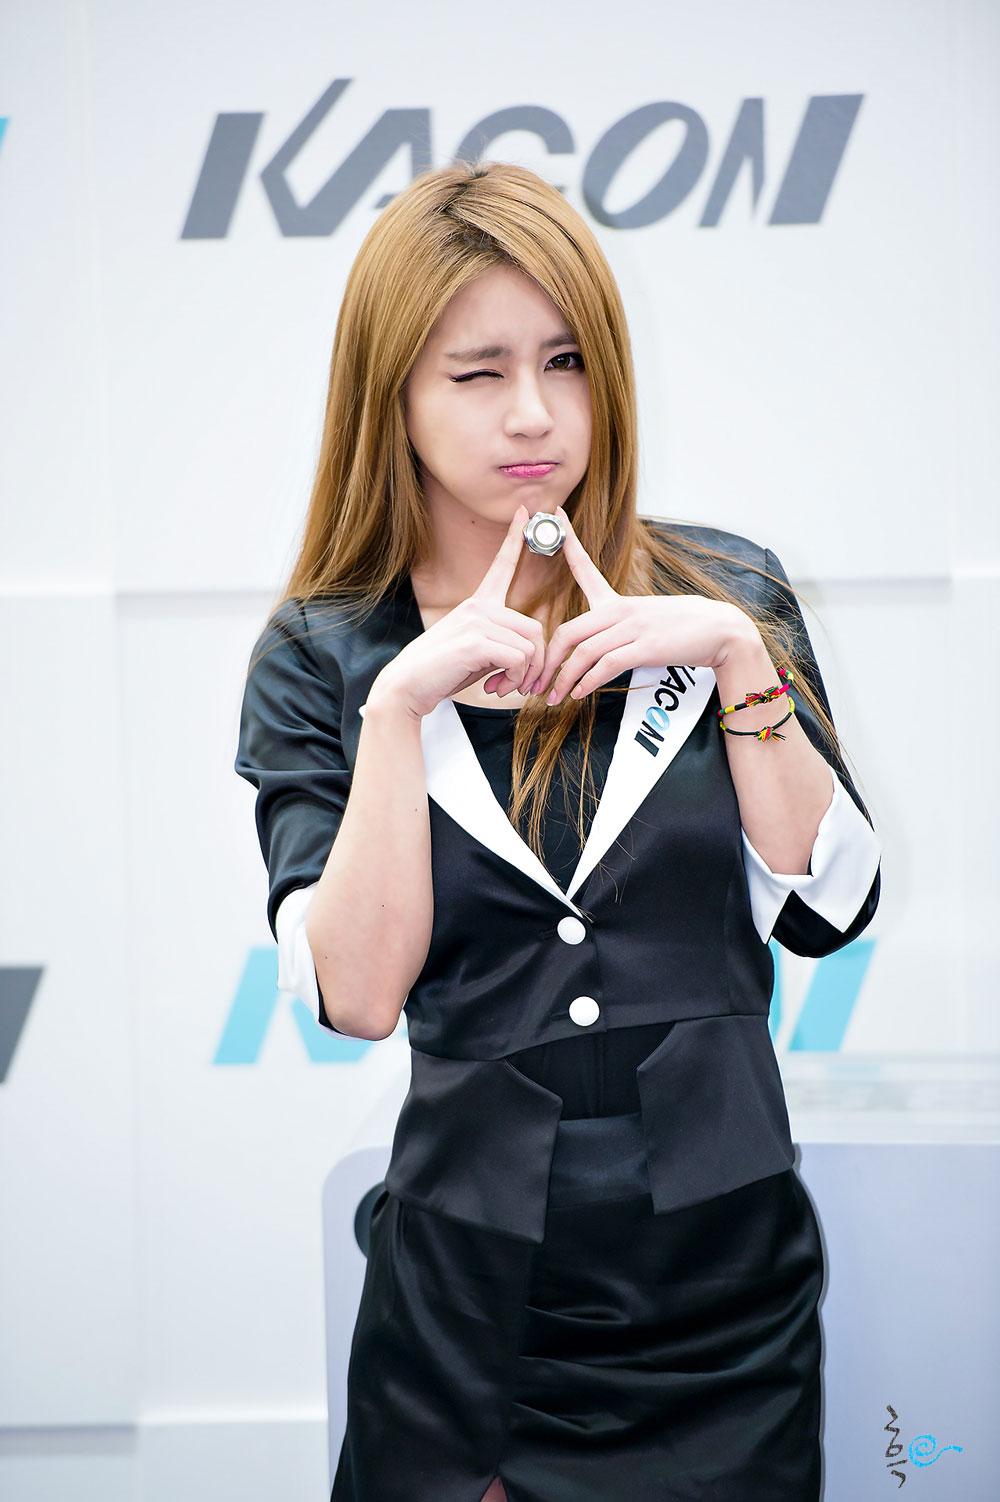 Park Si Hyun Automation World 2014 KACON